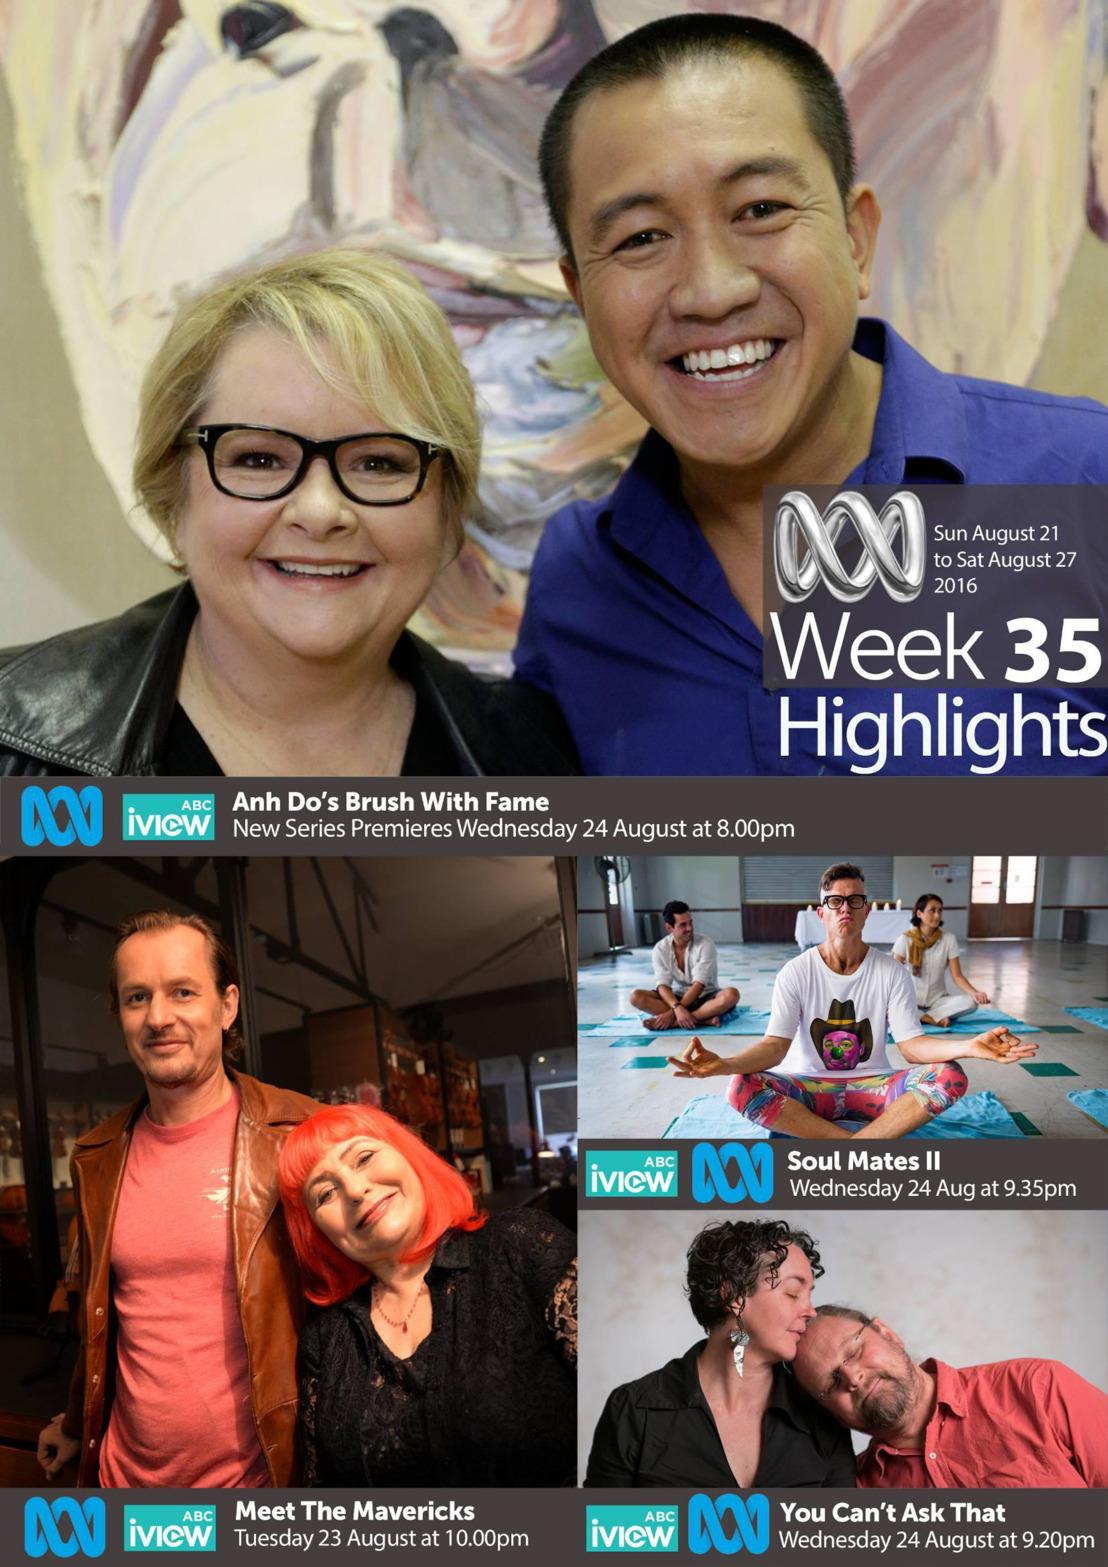 ABC Program Highlights - Week 35